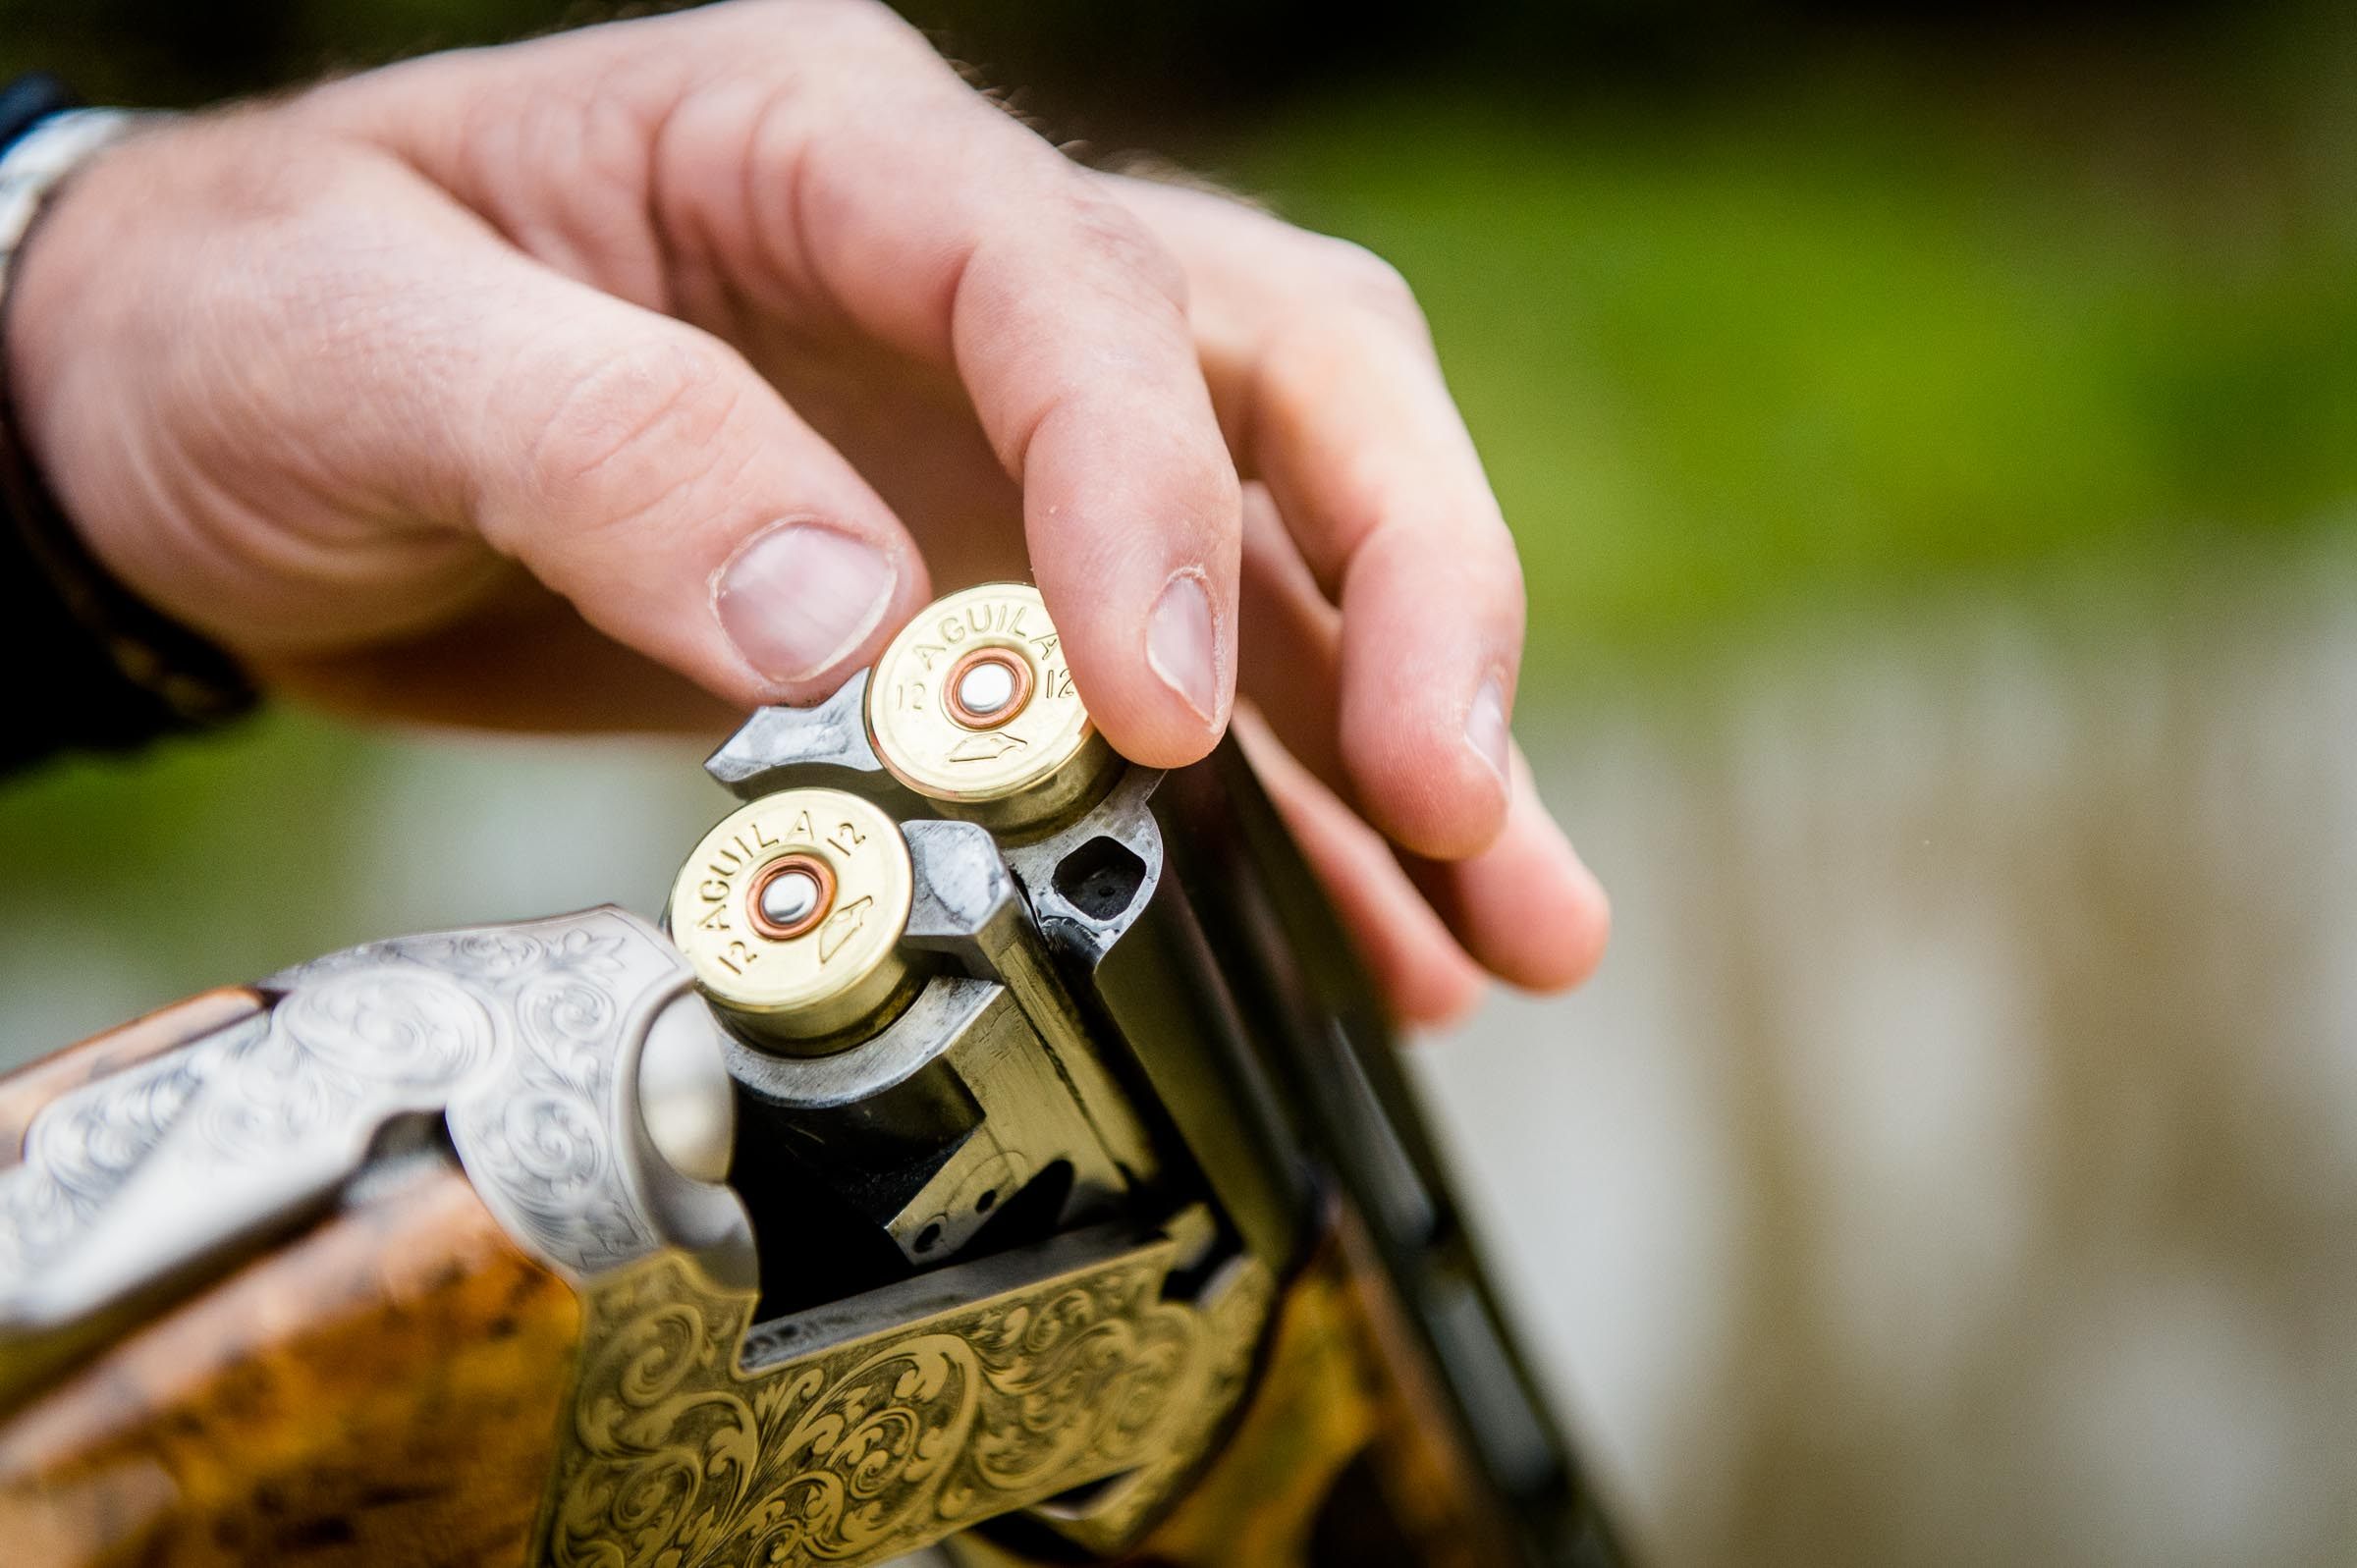 Aguila shotgun shells. © Tony Bynum